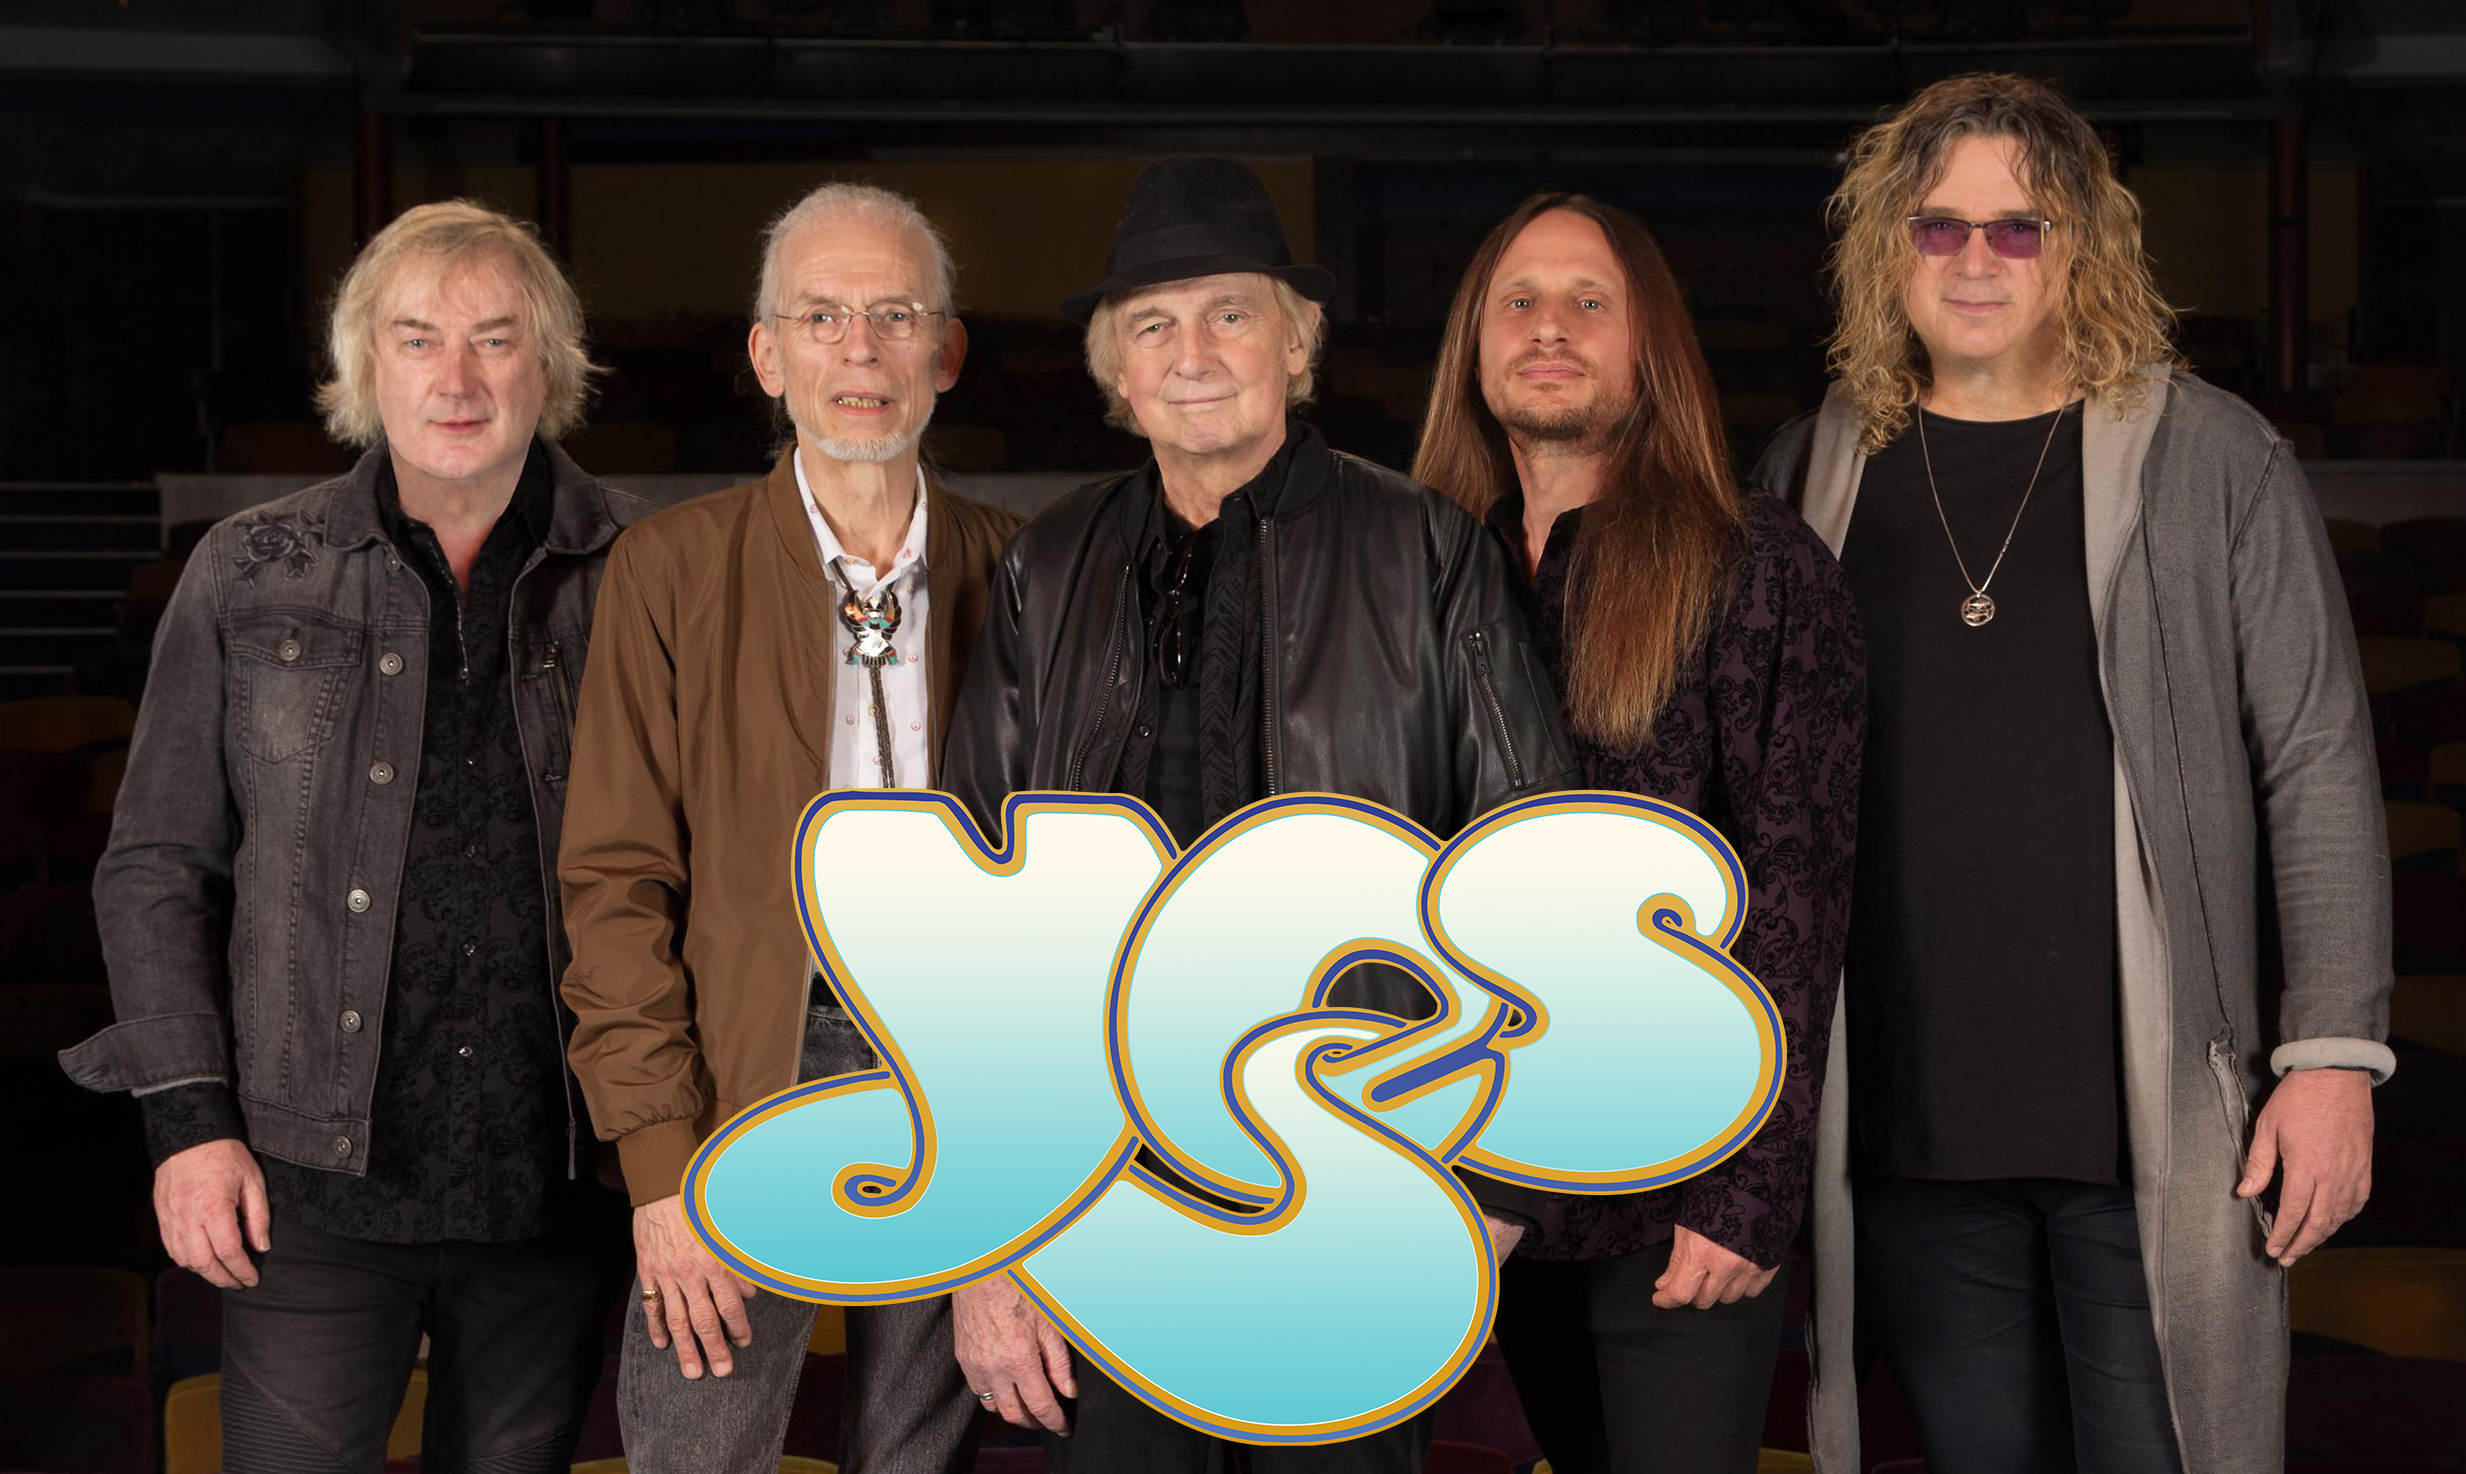 Yes featuring Geoff Downes, Steve Howe, Alan White, Jon Davison, Billy Sherwood, photo by Glenn Gottlieb